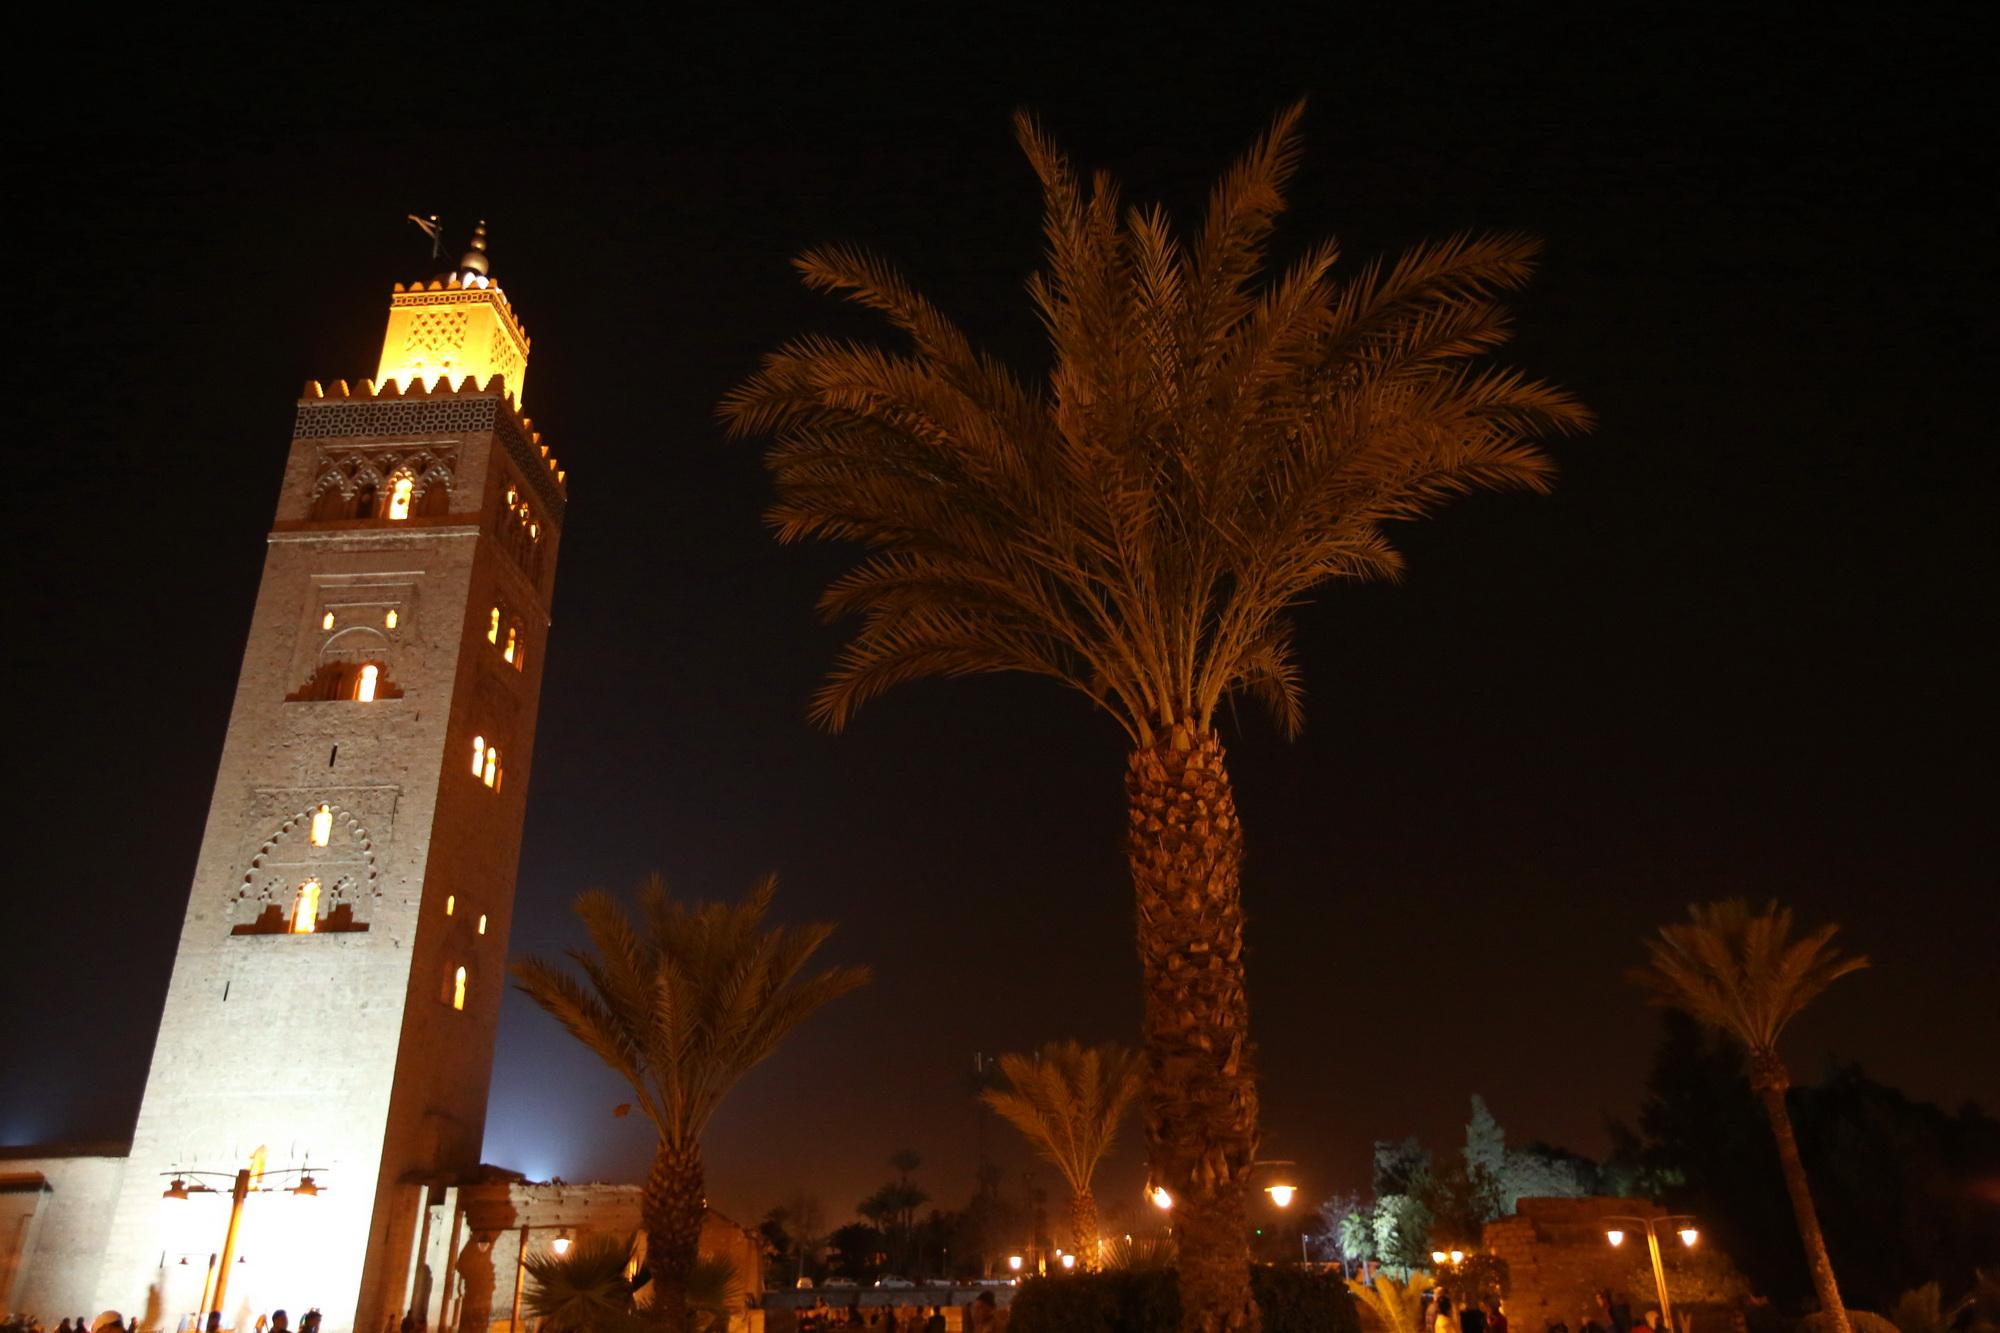 Marocco_IQ2A2849_∏ Luca Bracali